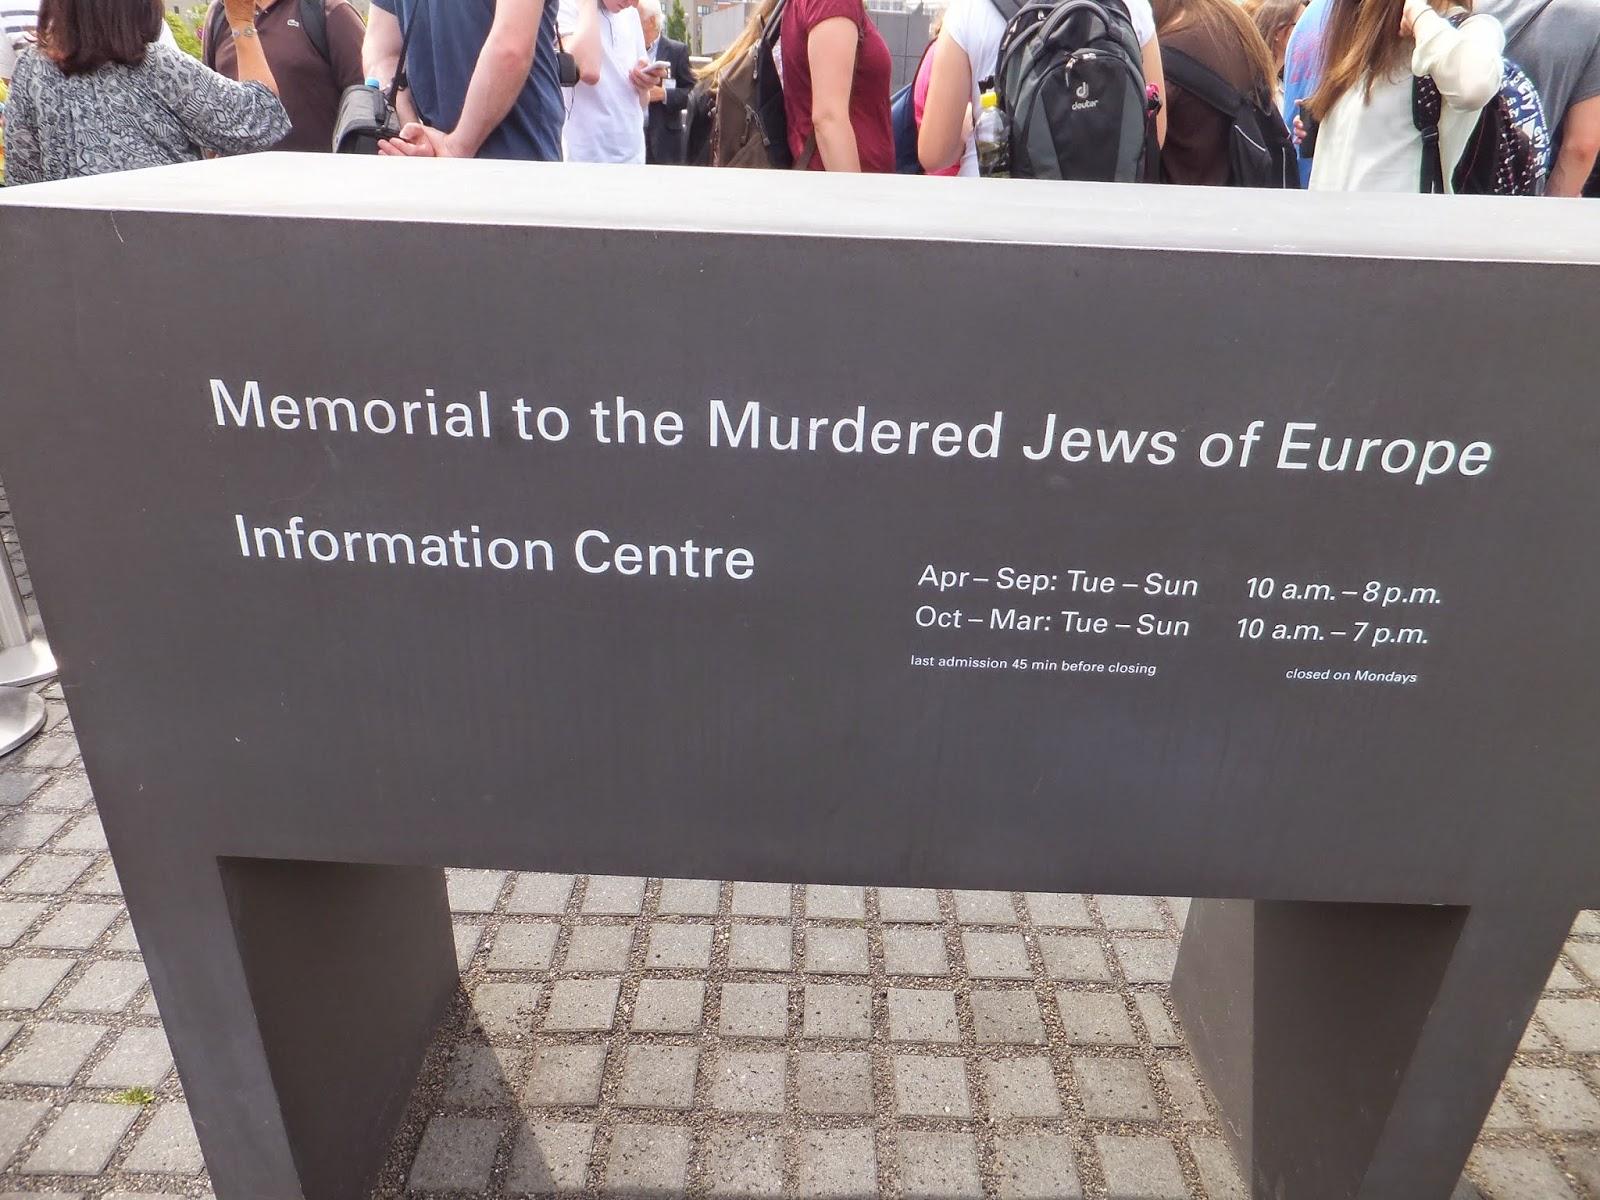 Memorial del Holocausto, Holocaust Mahnmal, Berlín, Elisa N, Blog de Viajes, Lifestyle, Travel